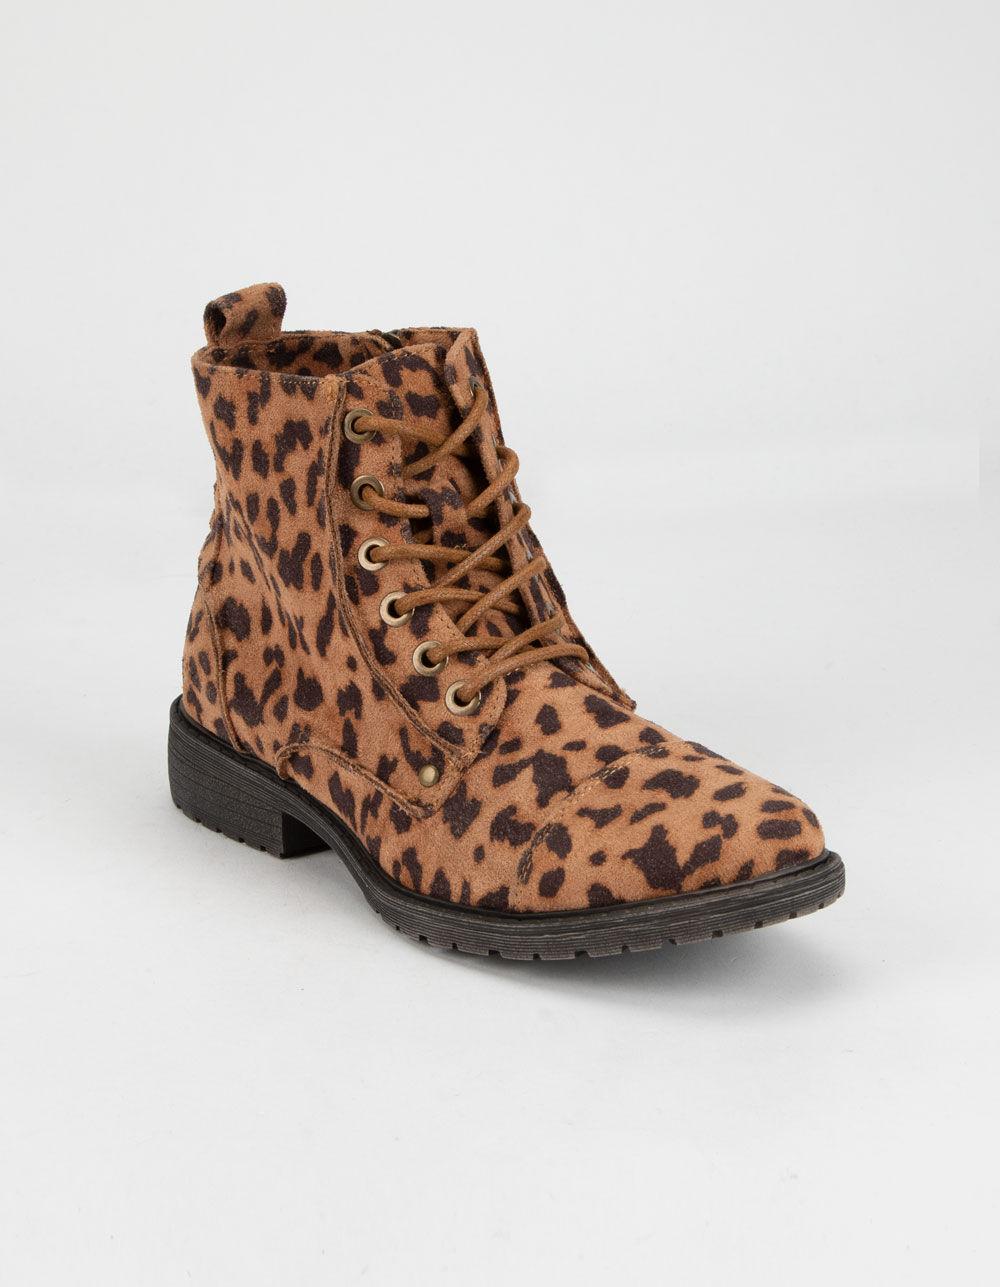 BILLABONG Willow Way Leopard Combat Boots